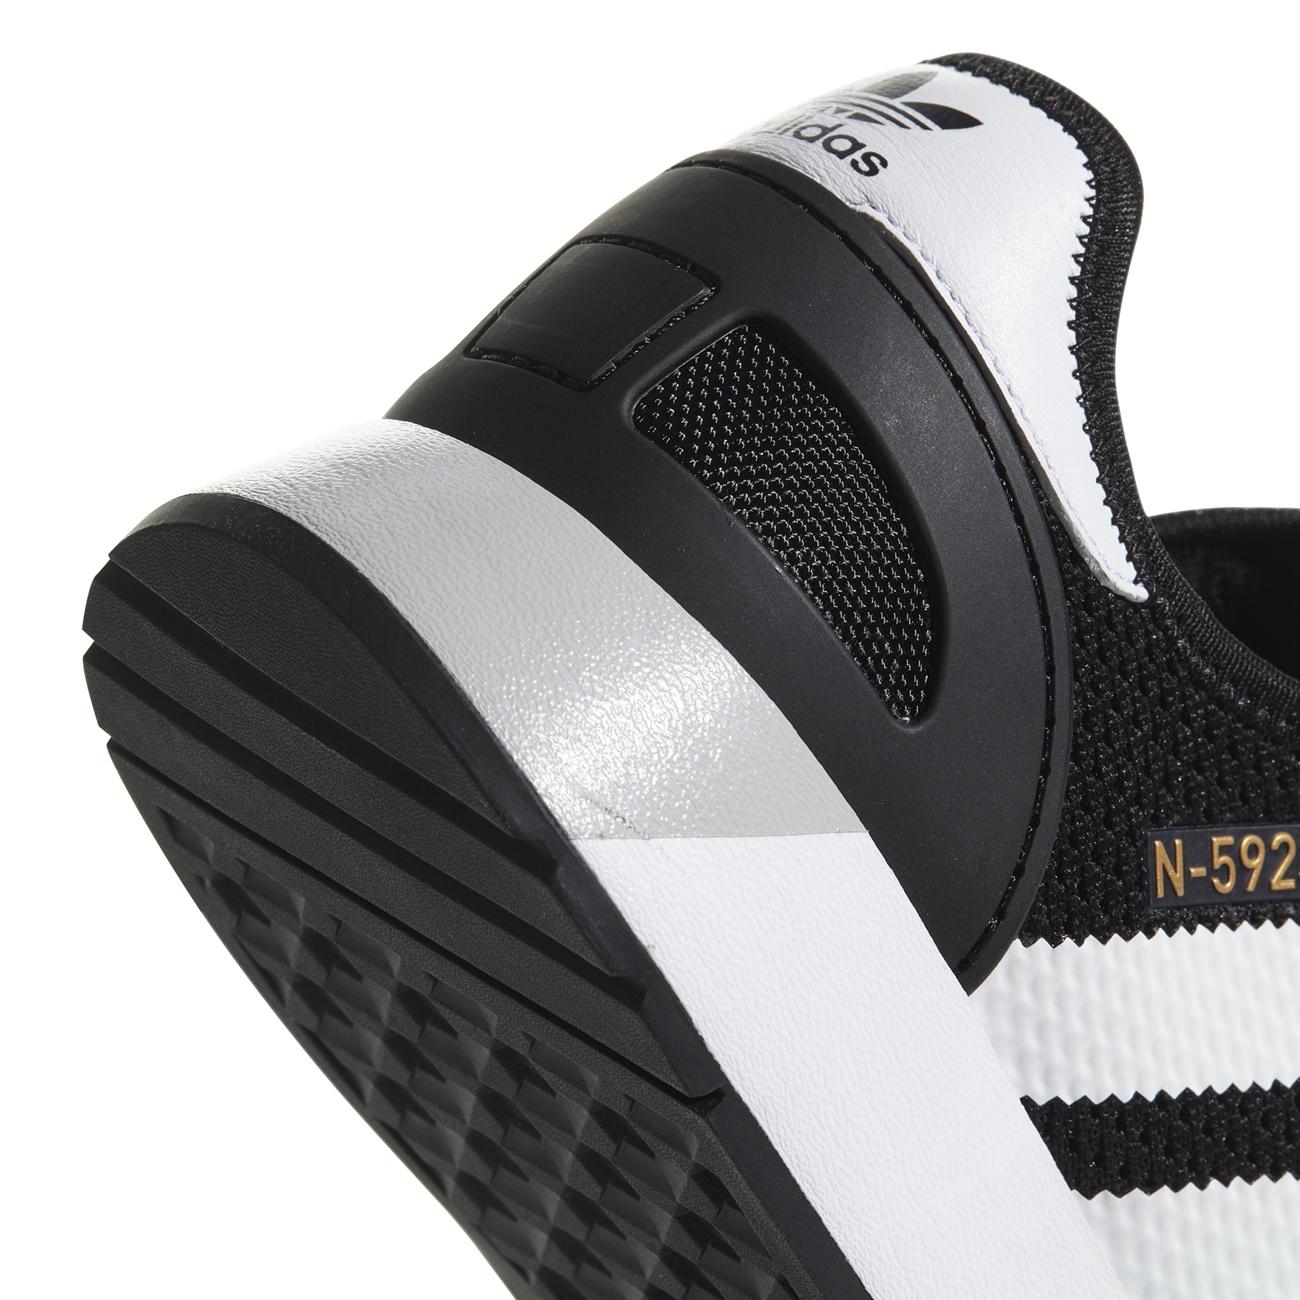 Adidas Iniki Runner N-5923 Schuh Halbschuh Schwarz Weiss Grau Sneaker CQ2337 NEU